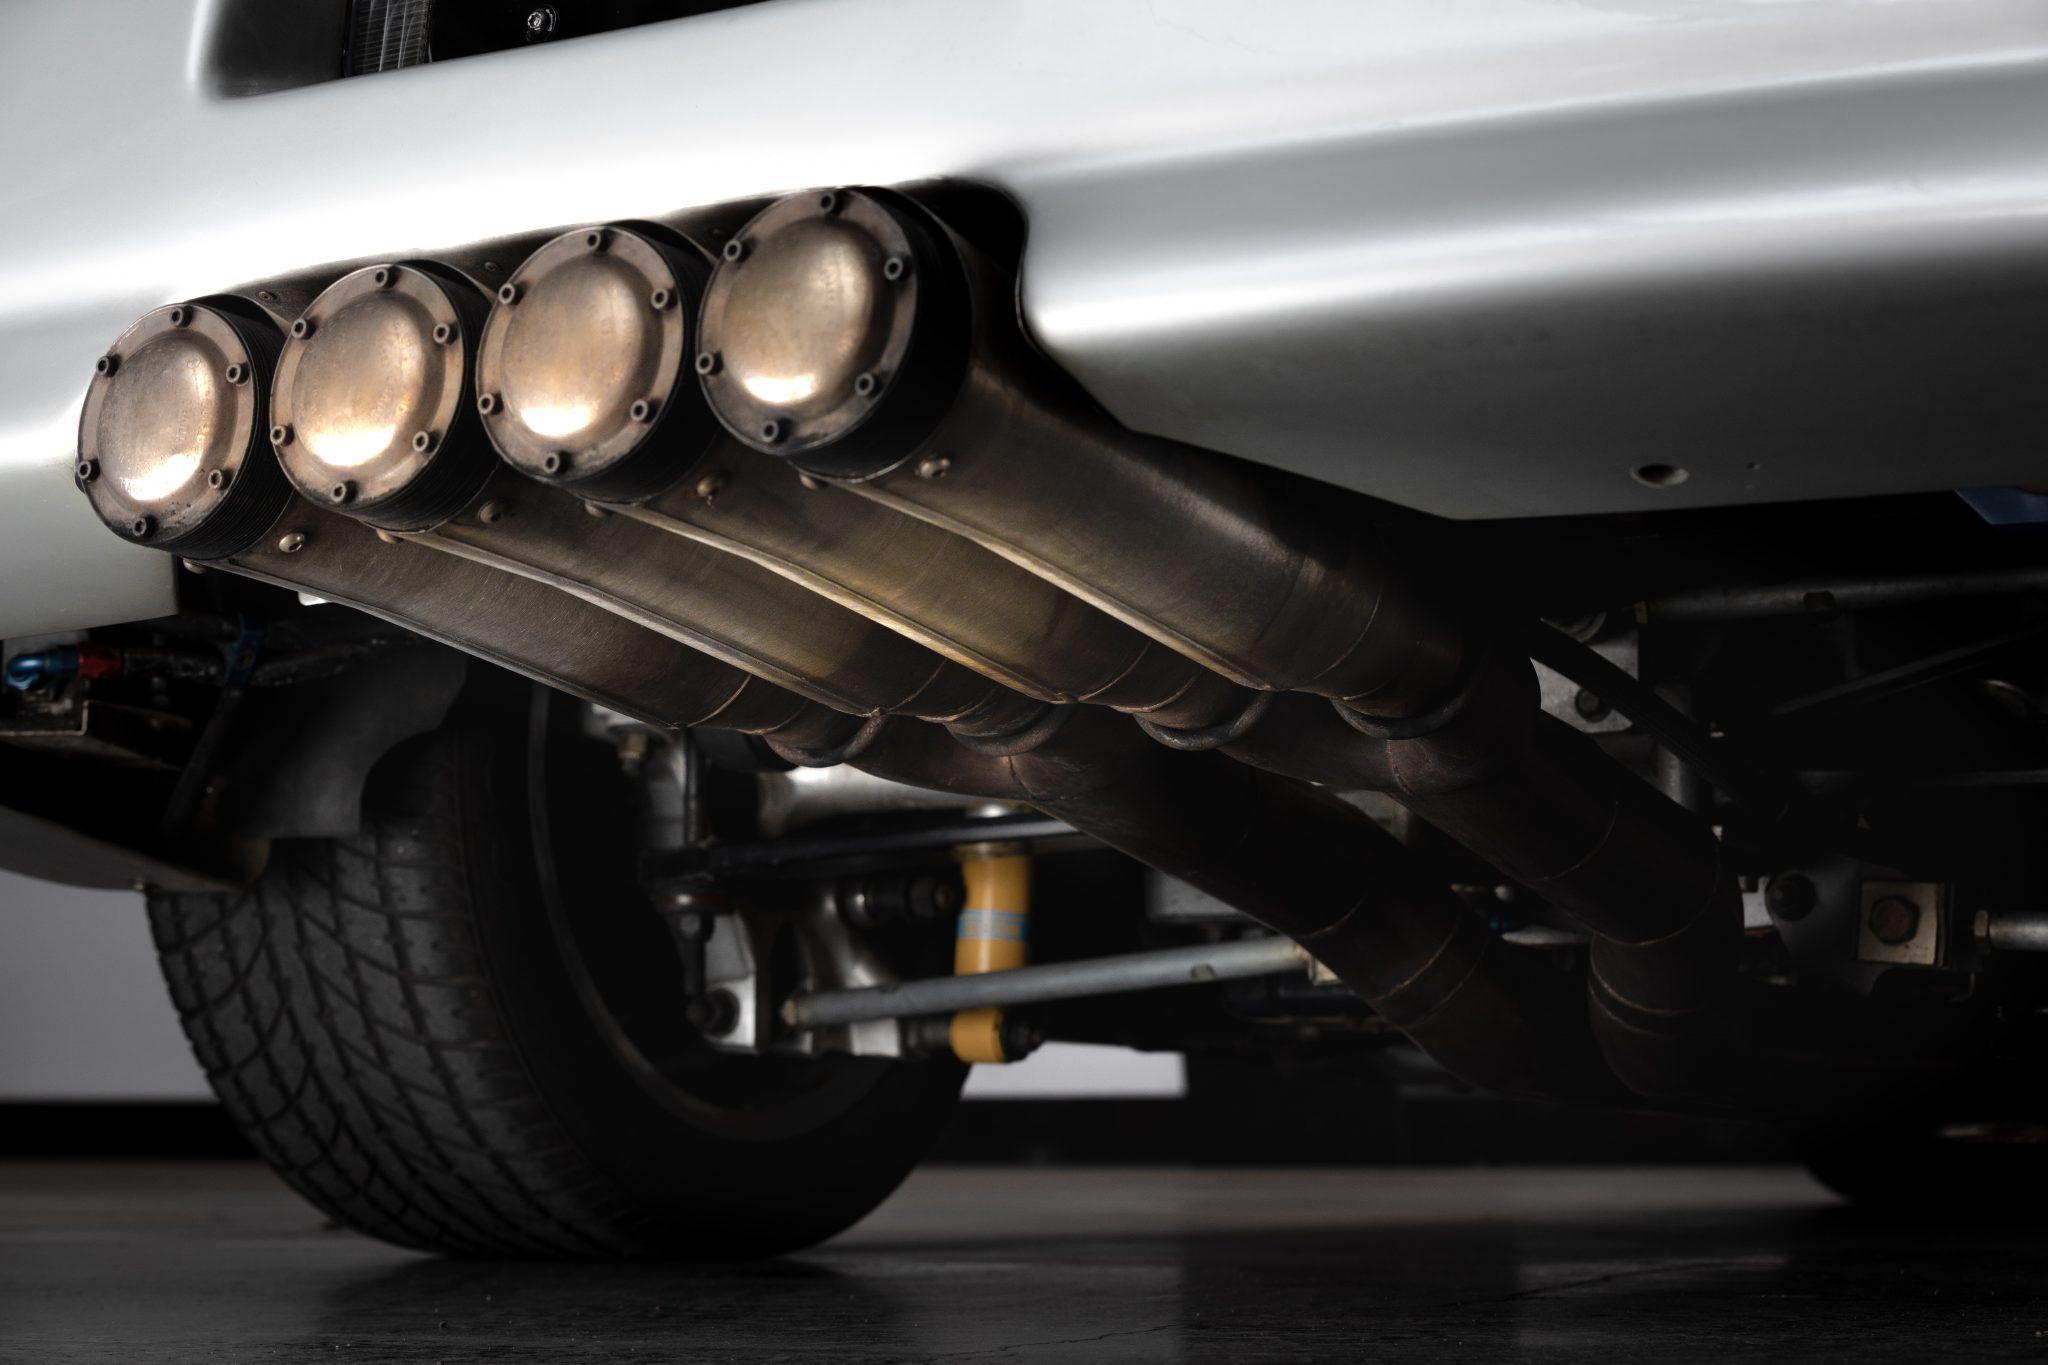 1988 Chevrolet Corvette Callaway SledgeHammer BaT exhaust diffuser quad